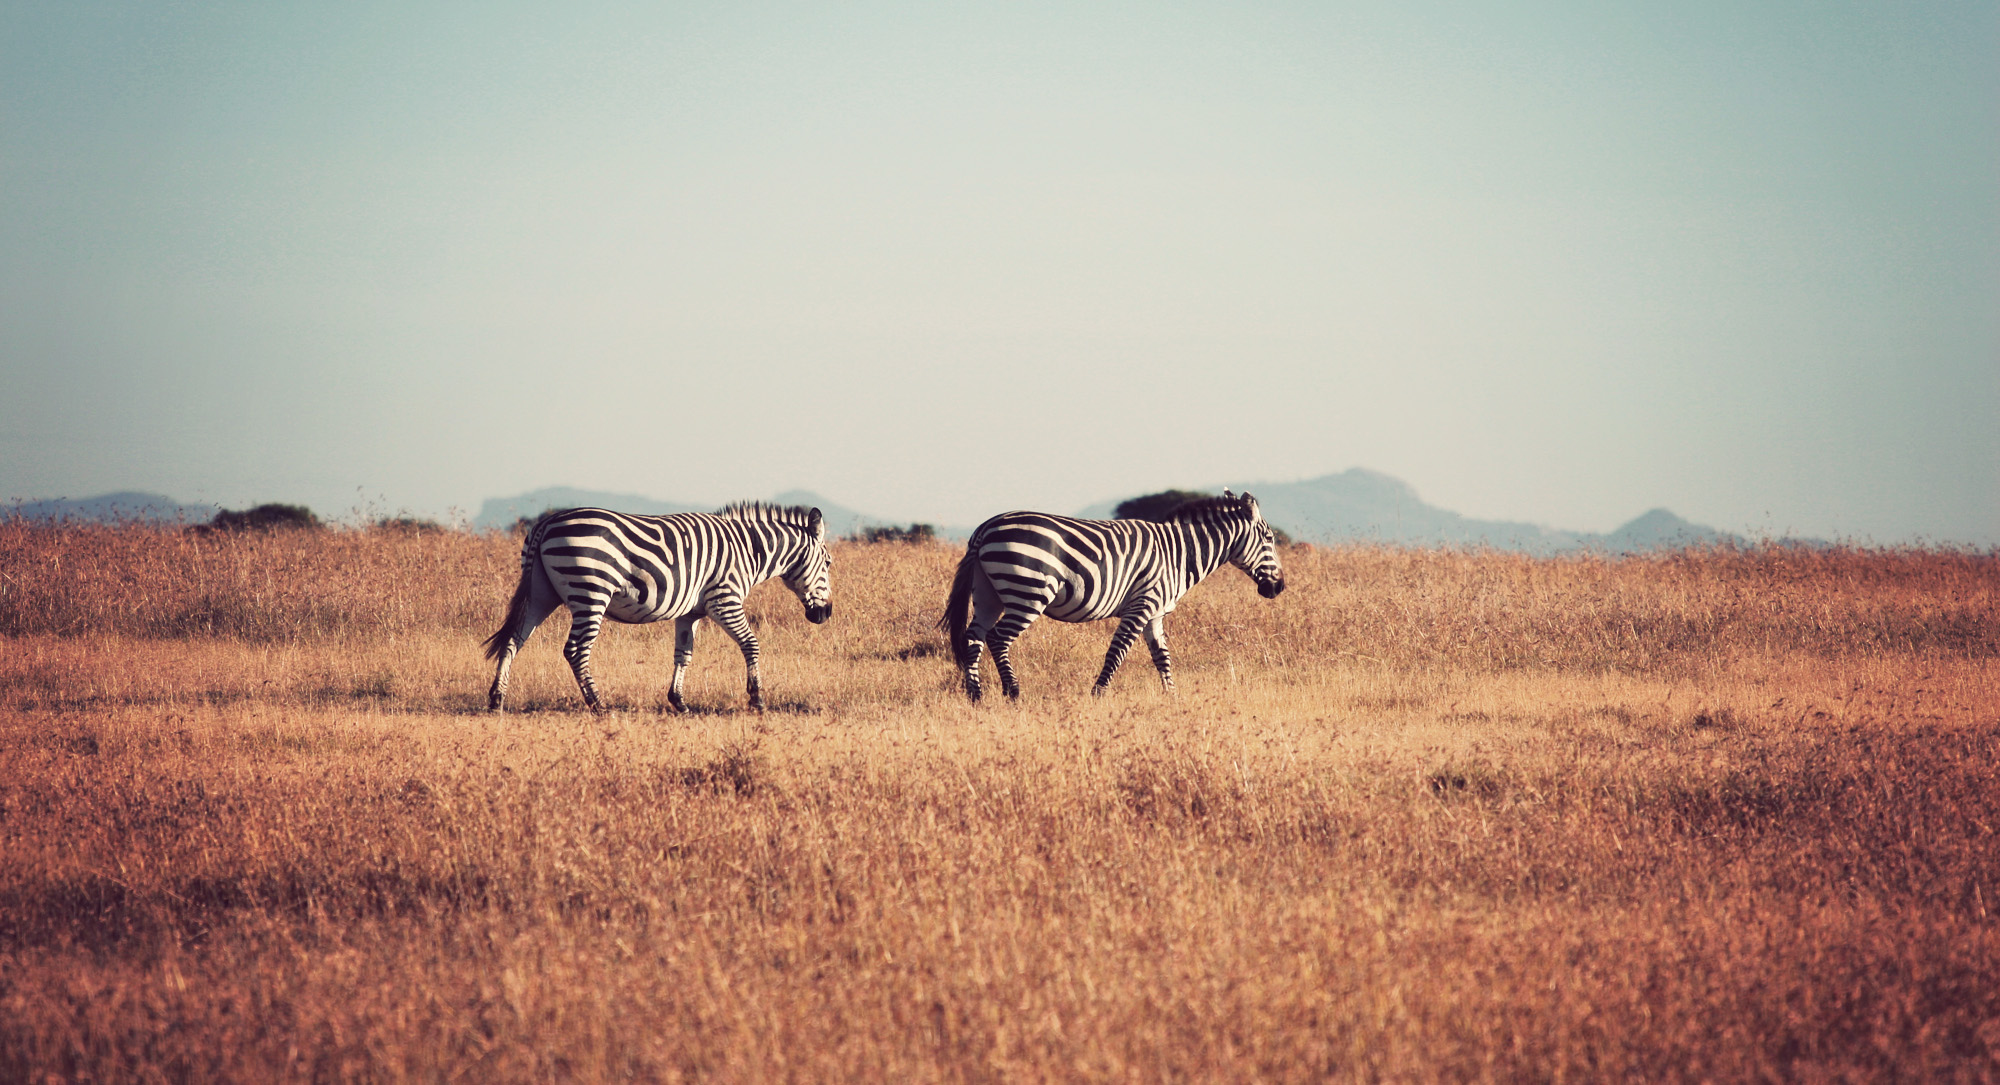 Day02_Sweetwater_Zebras_02.jpg